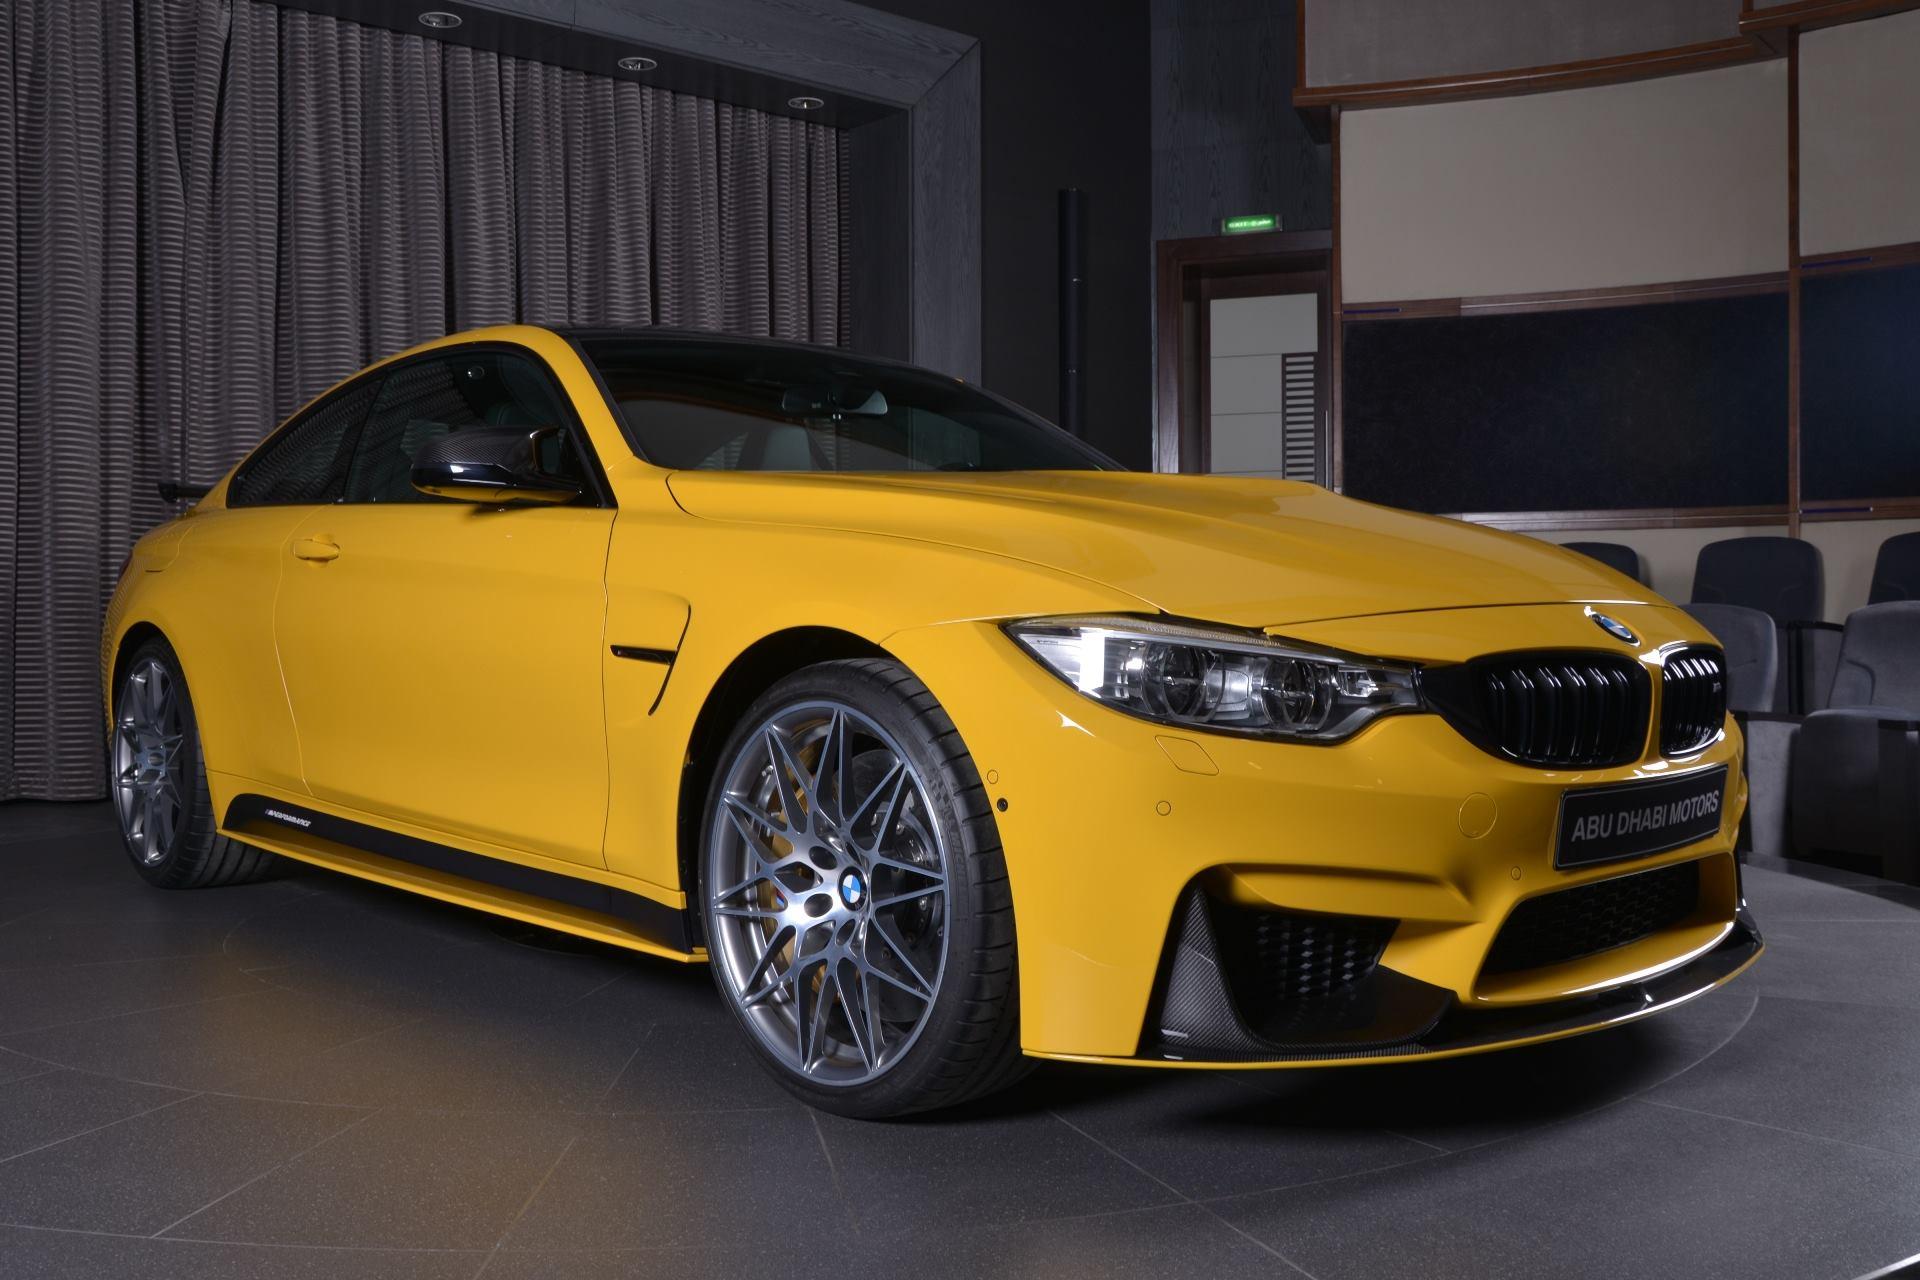 BMW M4 Speed Yellow (7)